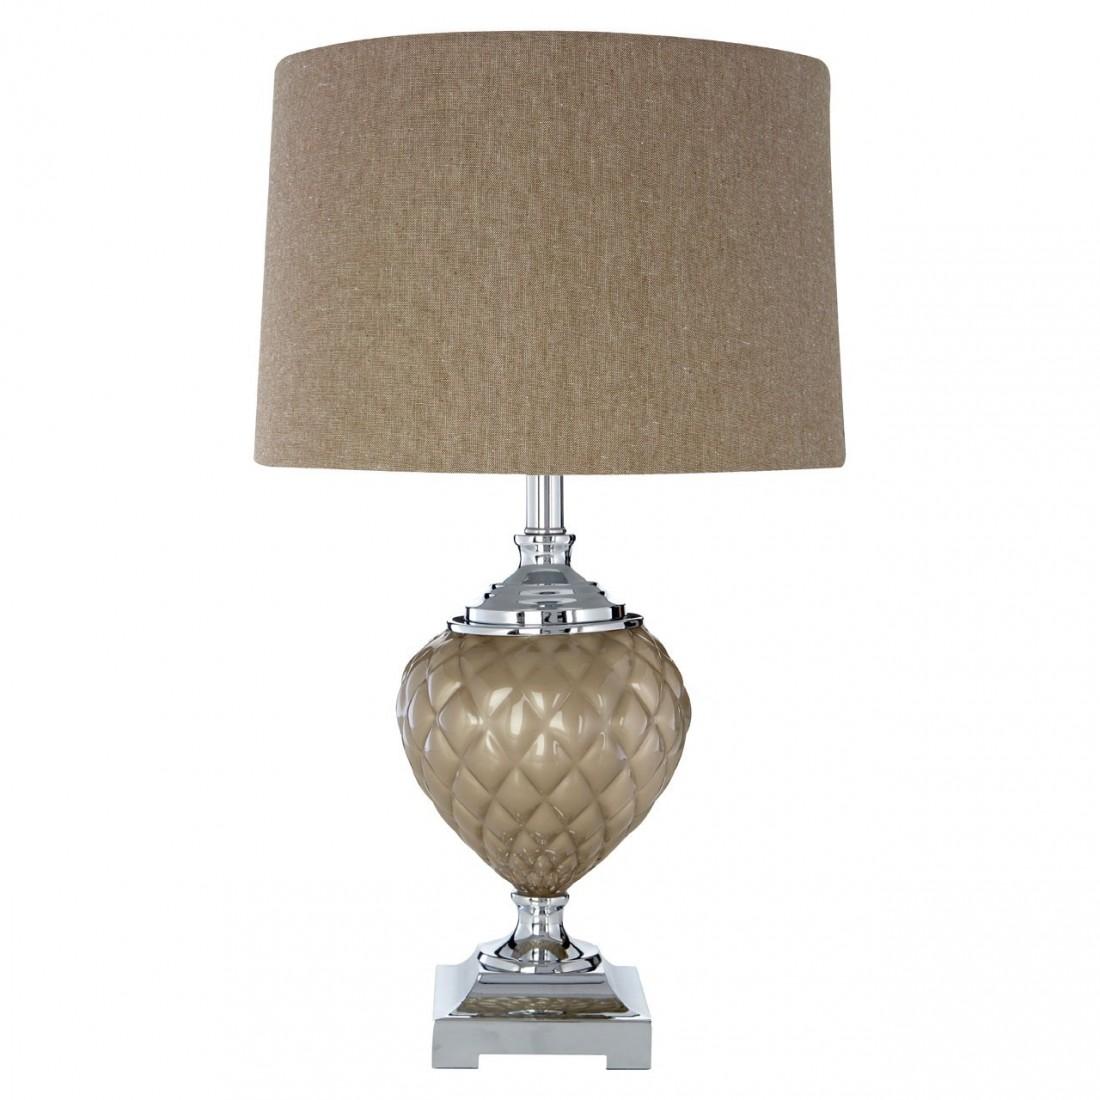 Kensington - Ulla stolní lampa